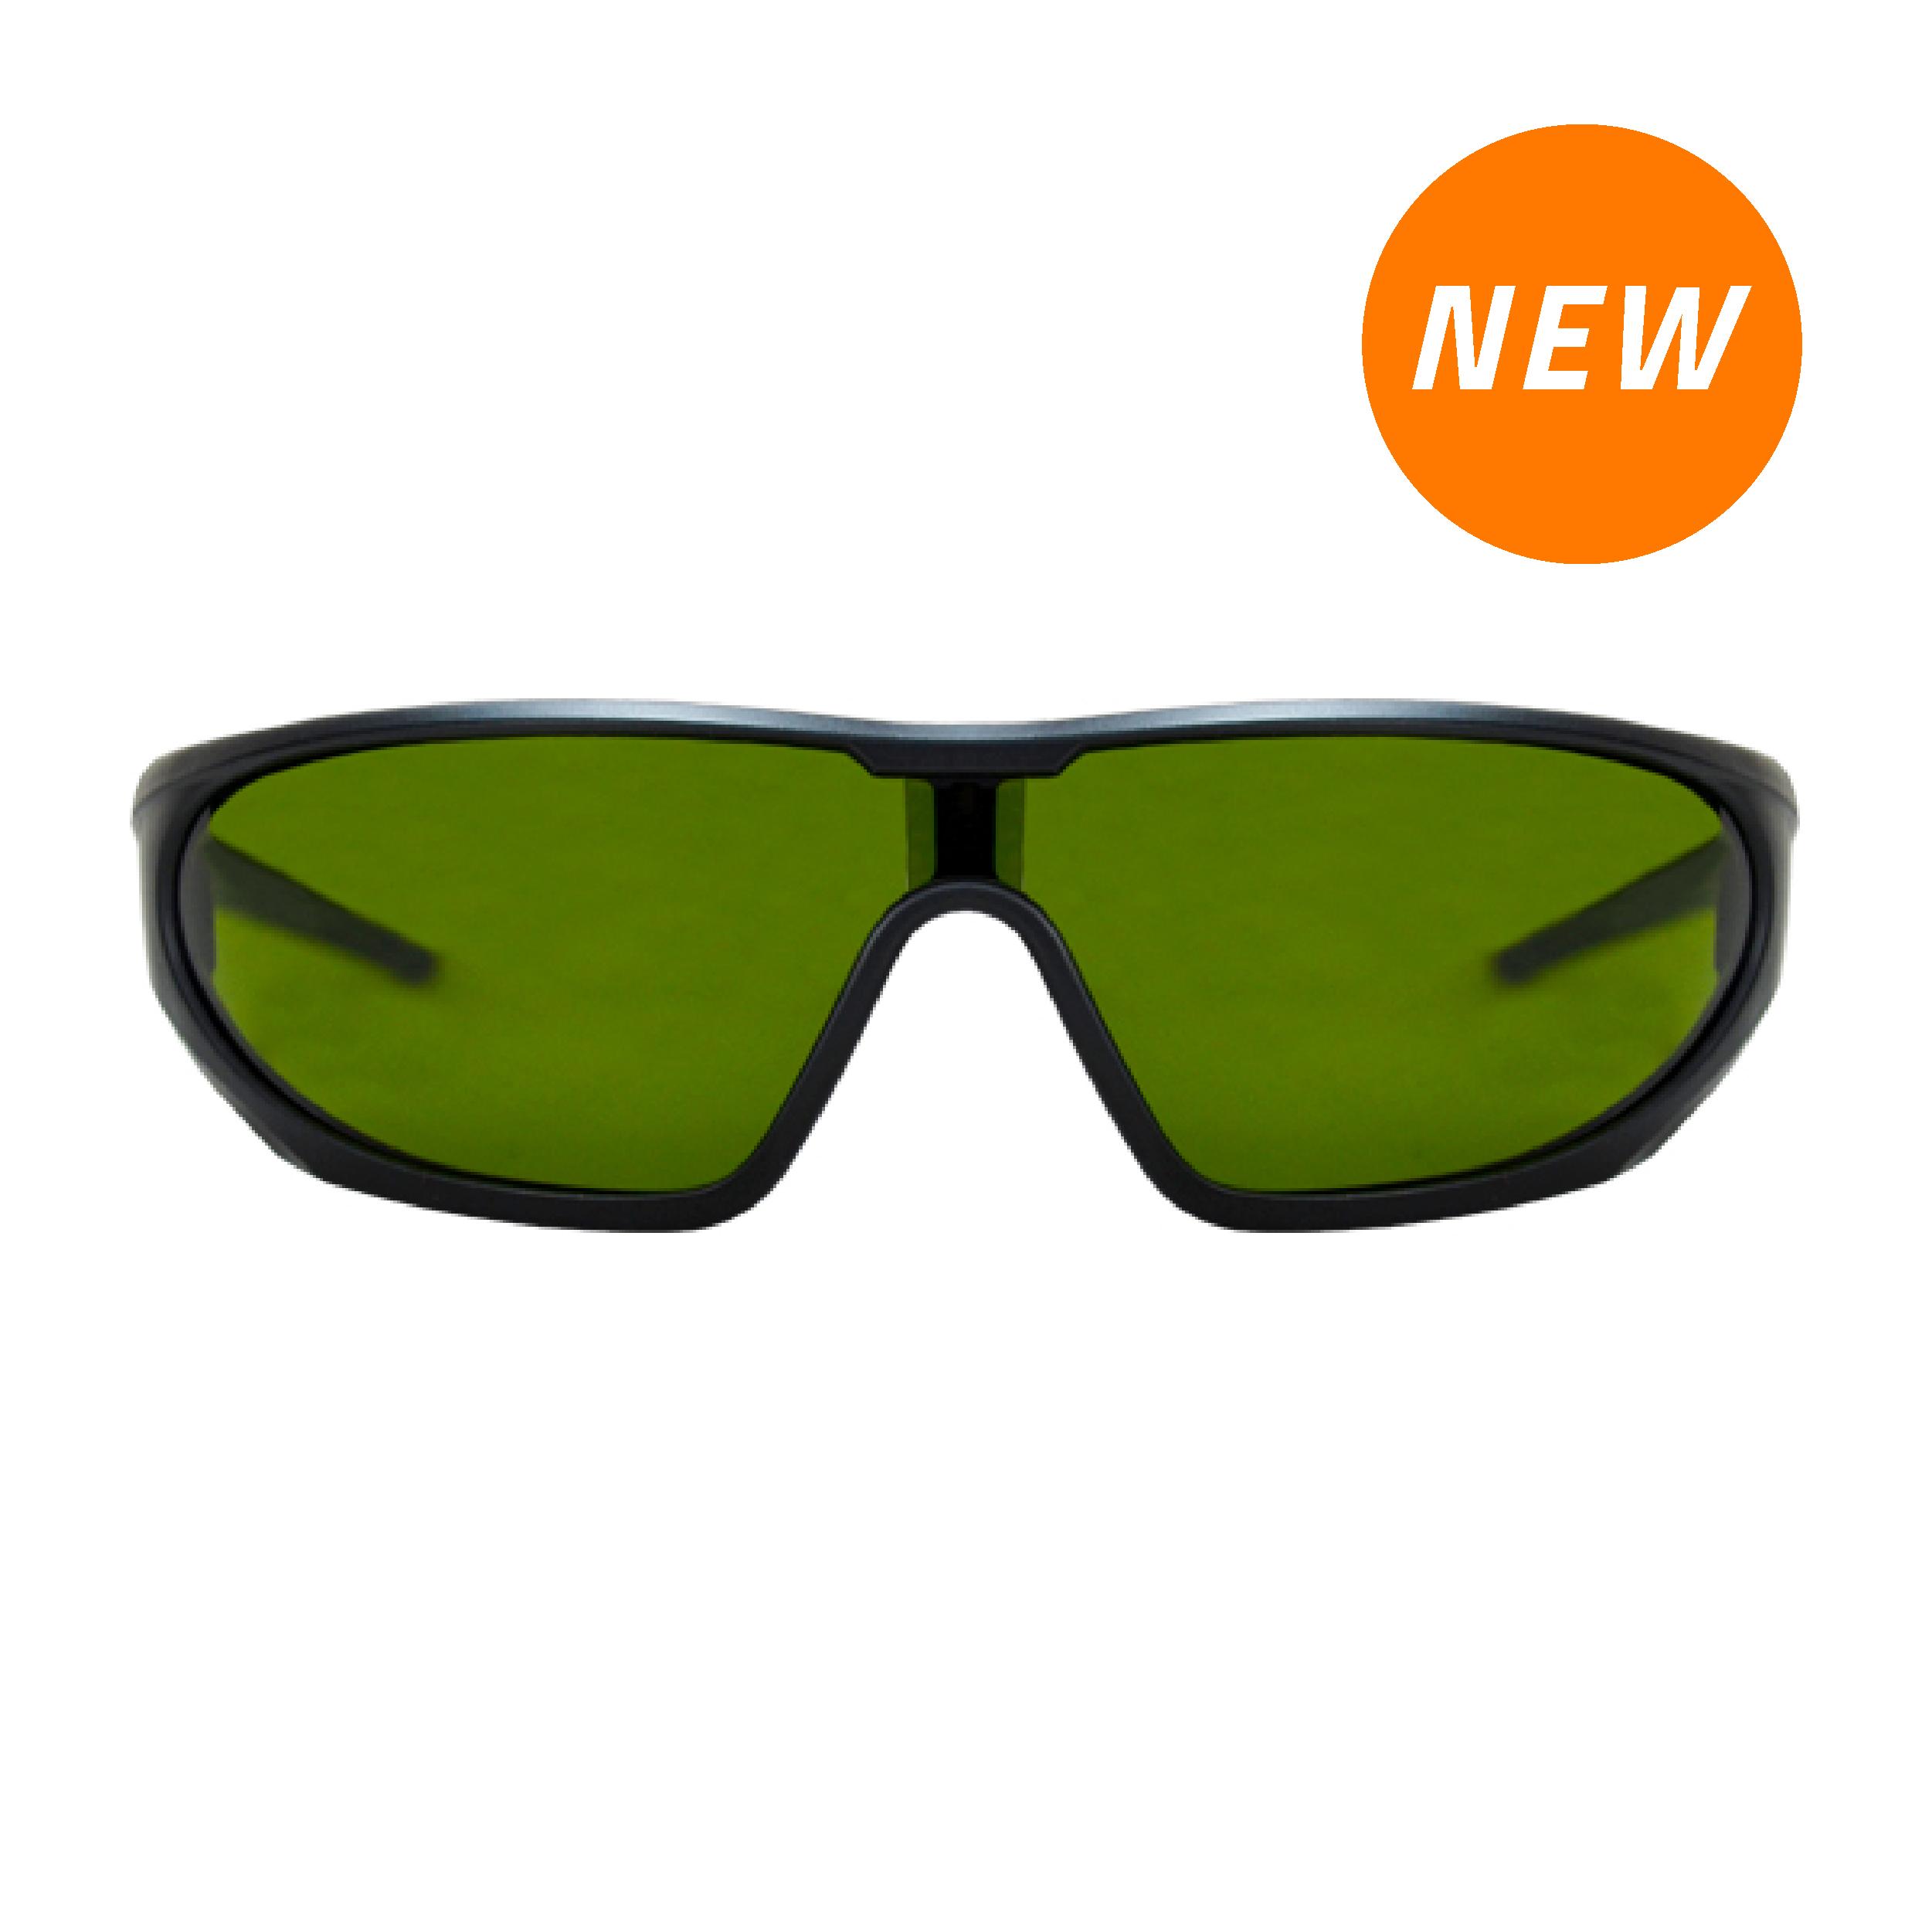 Lente Snakeye Policarbonato Sombra 3.0 Antiempañante con Armazón Negro Lamira Verde 4001-S3 IR3 AF … - 0